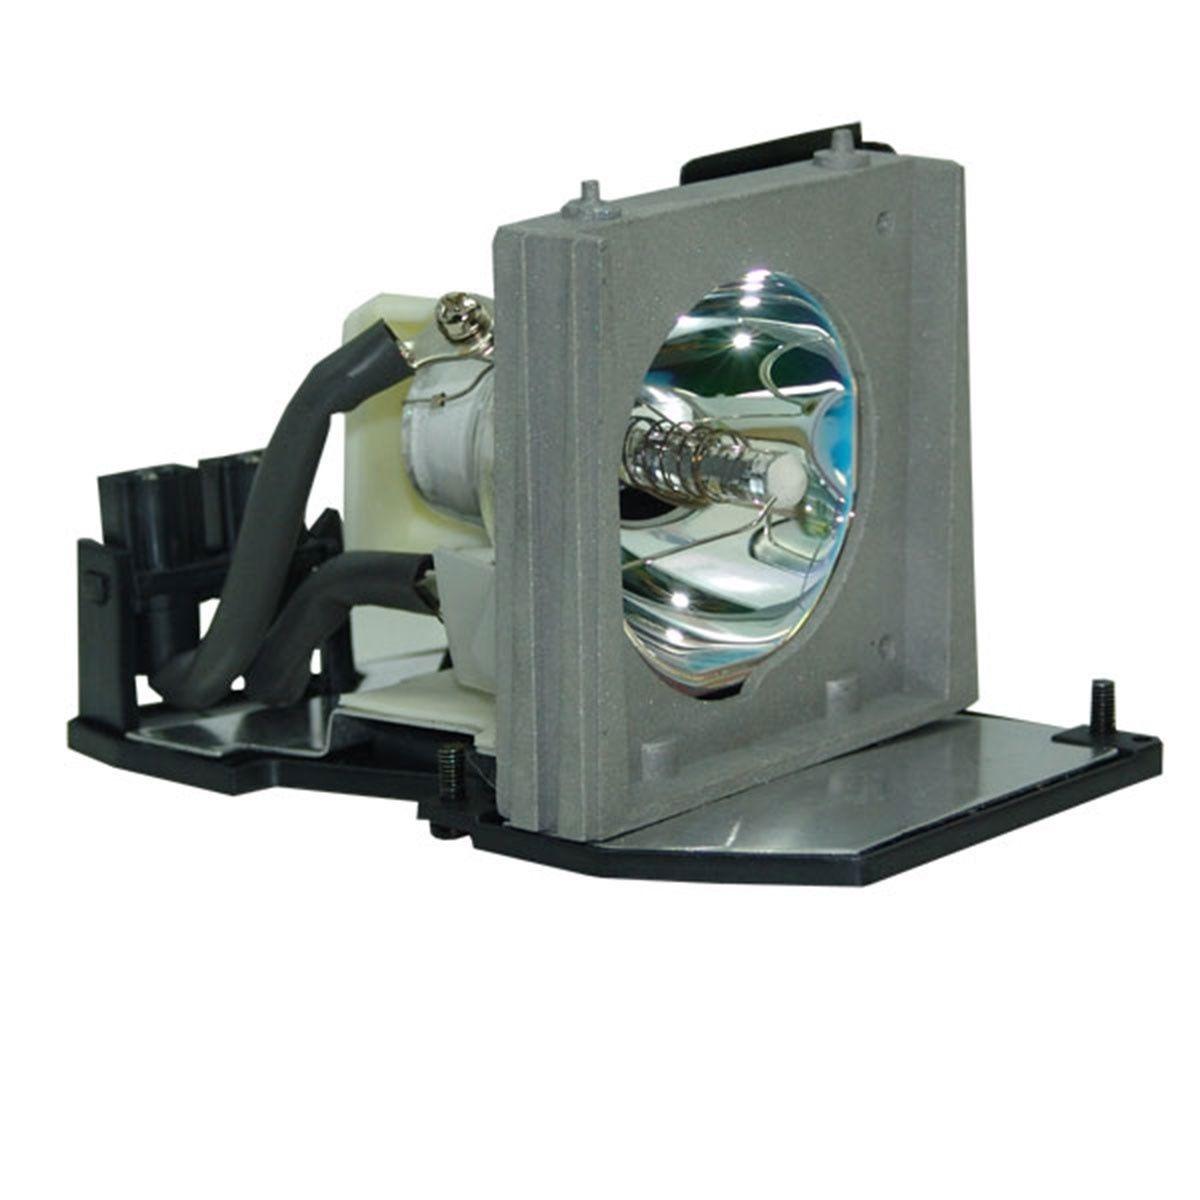 Projector Lamp Bulb EC.J1001.001 for Acer PD116P PD116PD PD523 PD525 PD525D with housing projector lamp with housing ec j1001 001 for projector pd116p pd116pd pd523 pd525 pd525d pd525pw pd521d